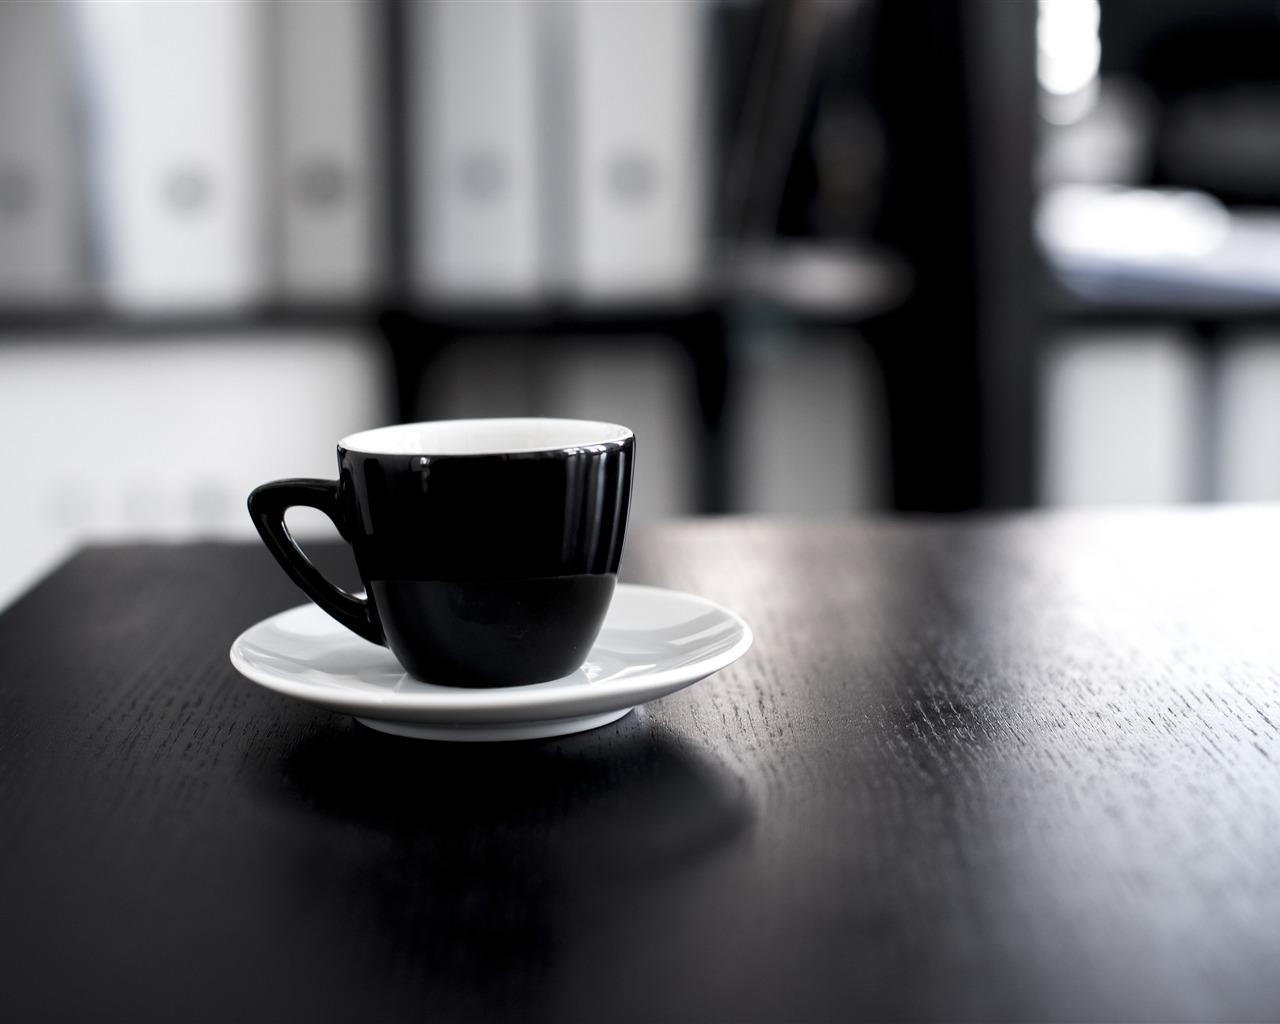 Negro, escritorio, café, blanco taza negra, primer plano Avance    10wallpaper.com